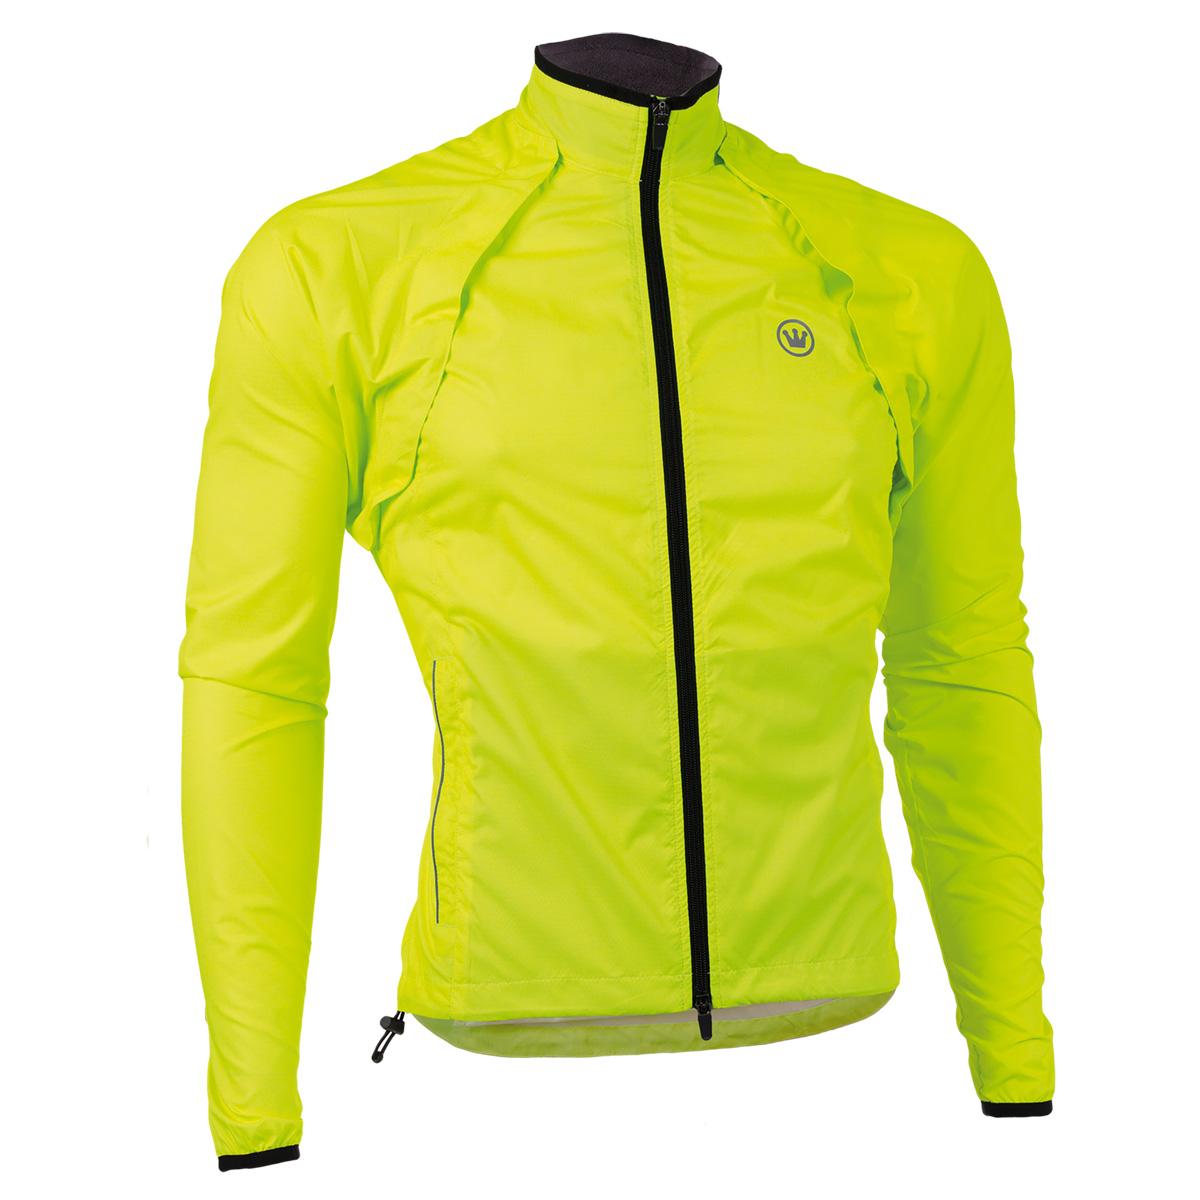 Canari Cyclewear 2016/17 Men's Optimo Convertible Cycling...